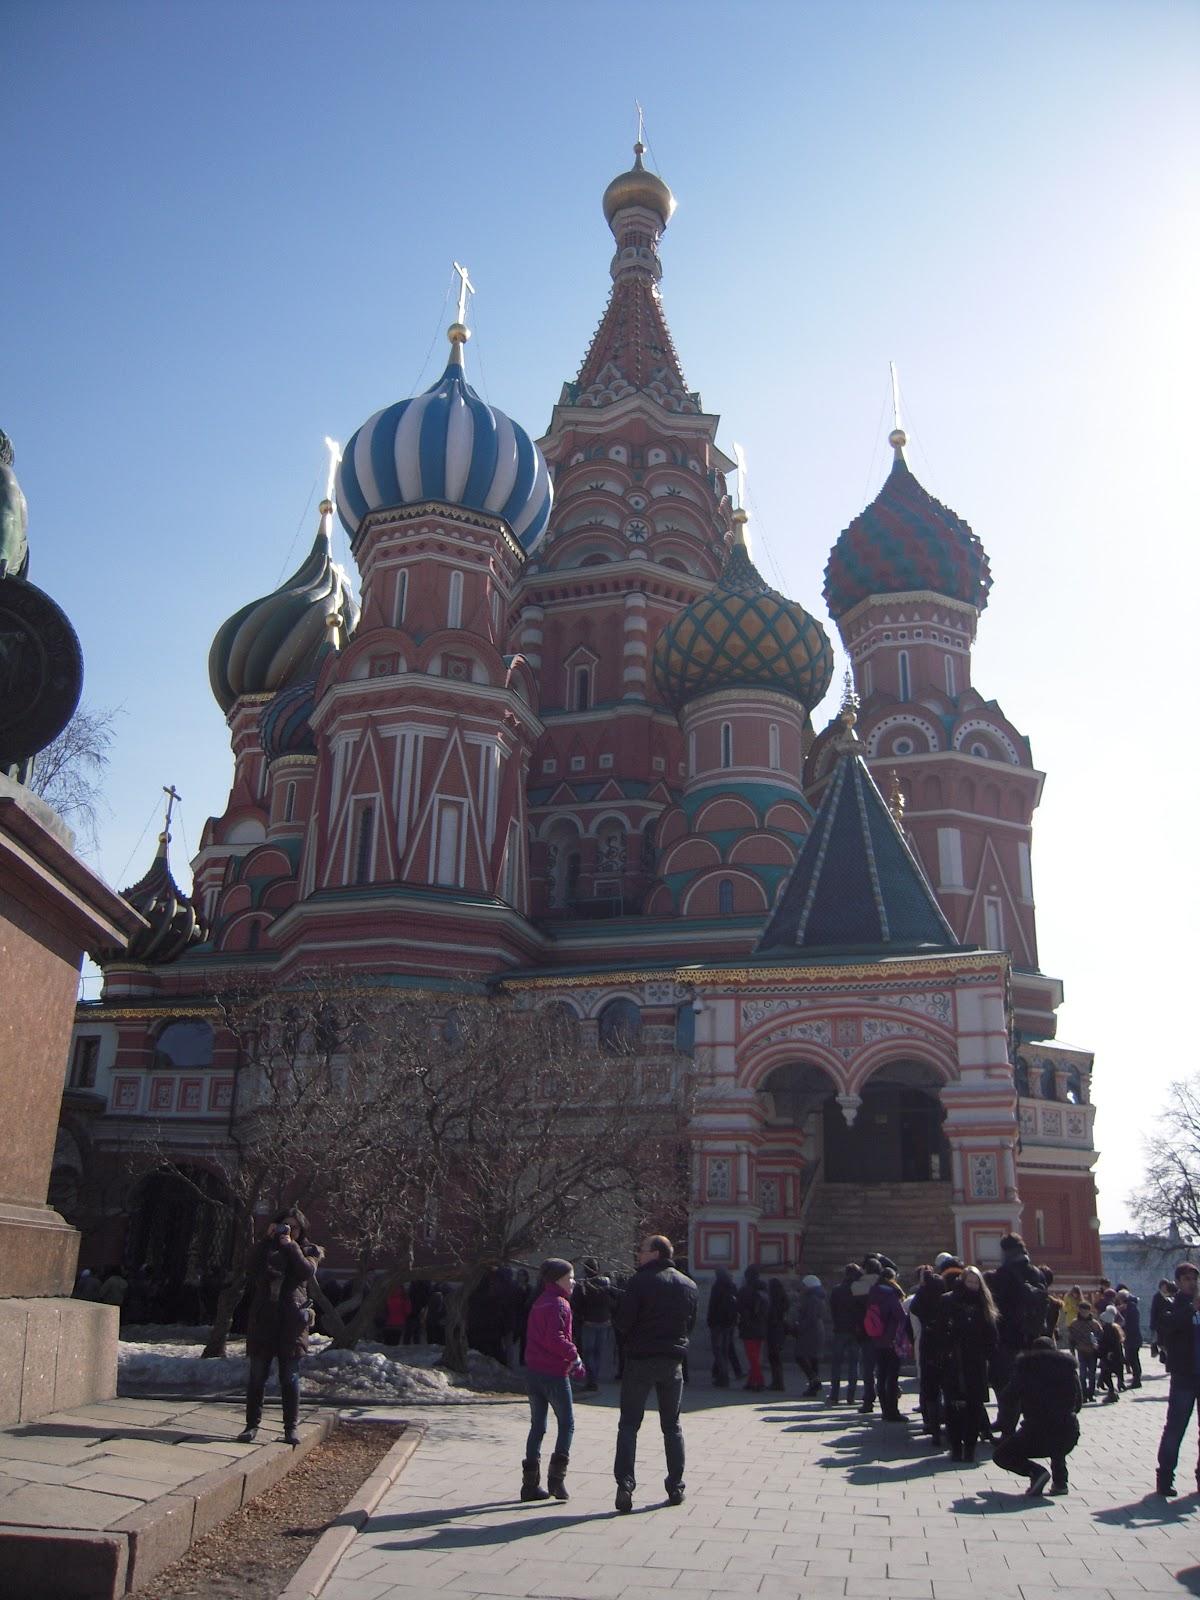 My Blog: 俄羅斯 DAY2 (莫斯科--克里姆林宮,紅場,列寧山,軍事博物館)